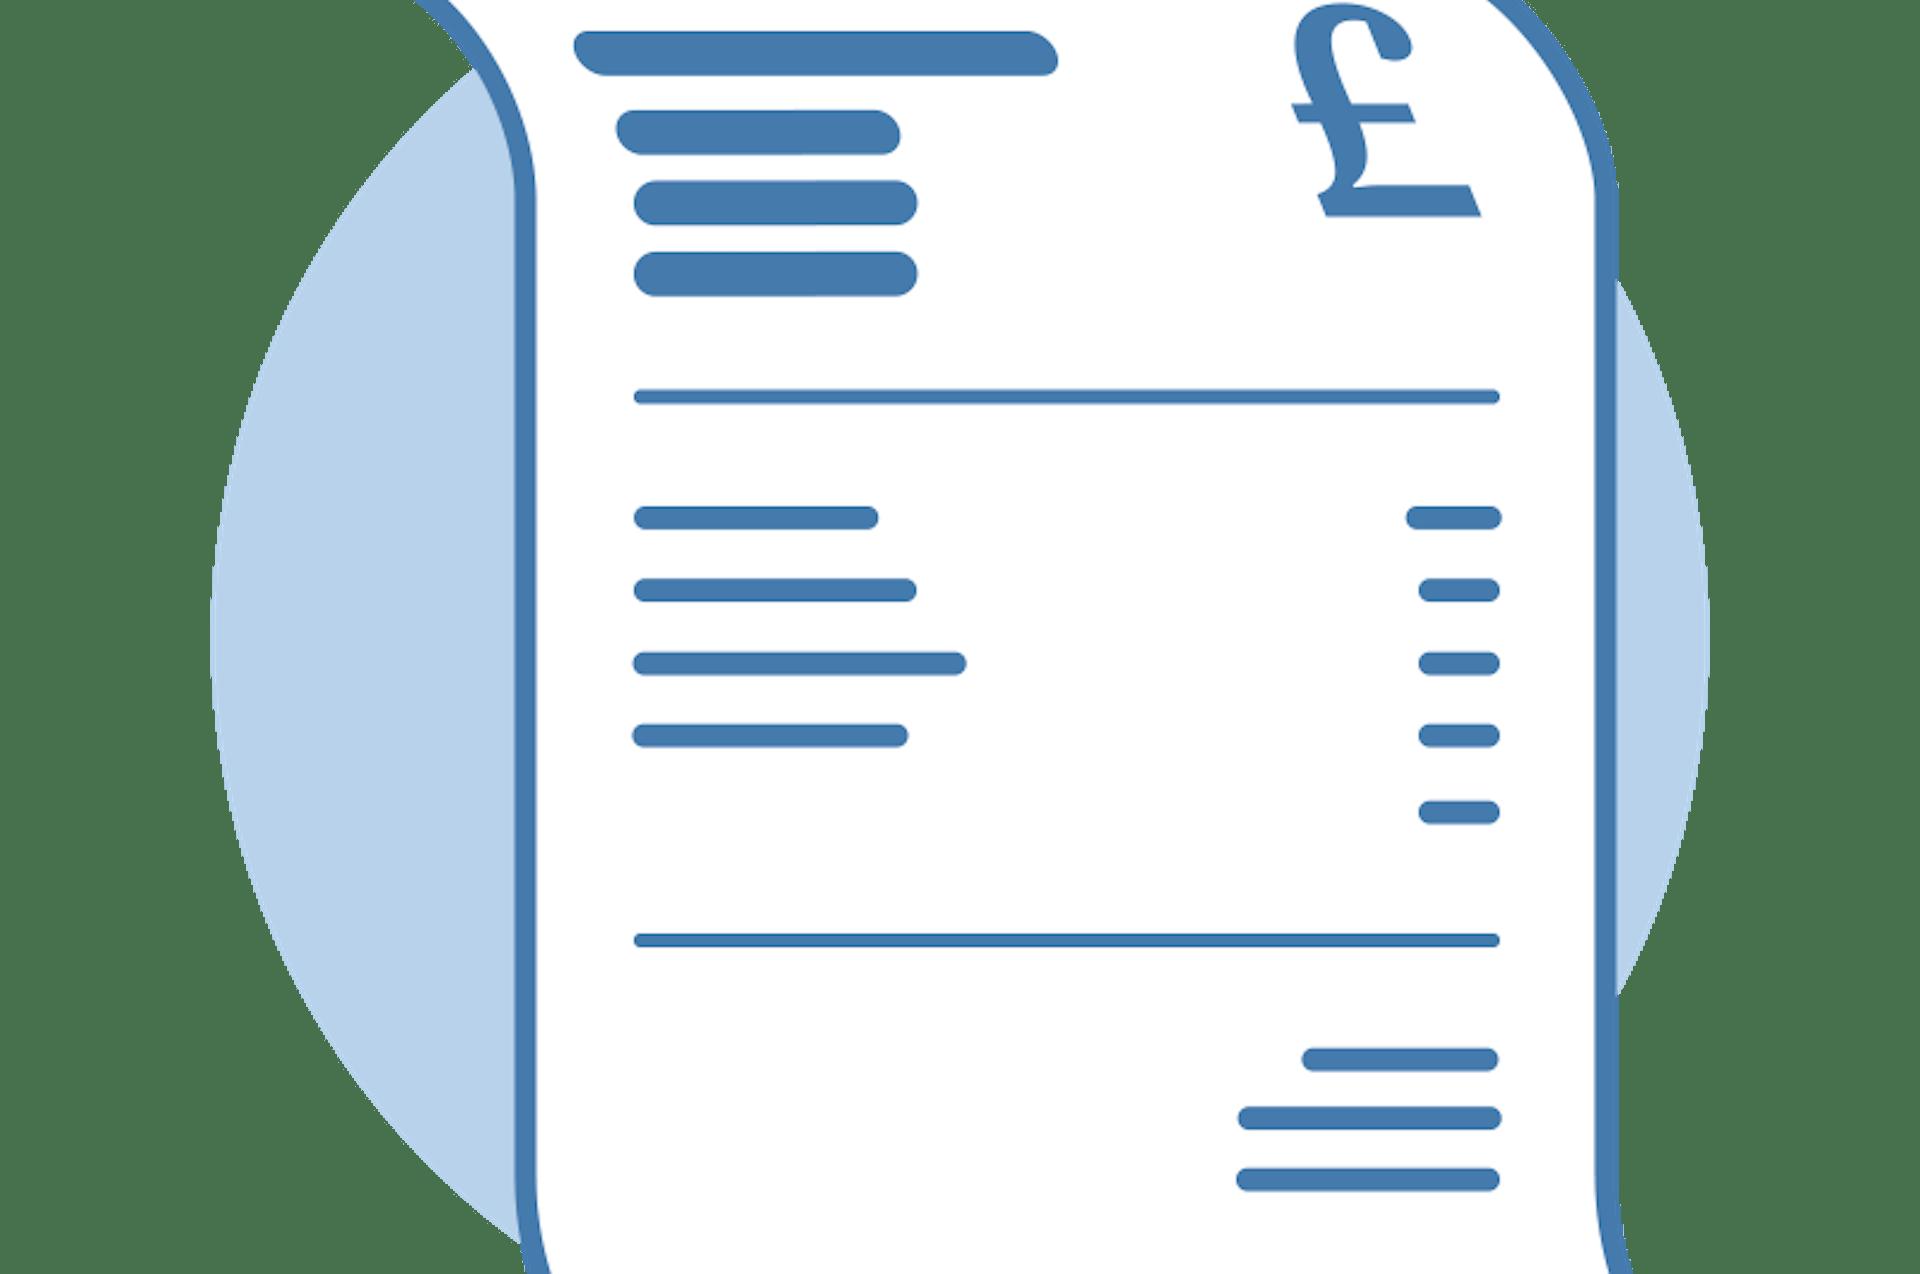 Illustration of an itemised invoice